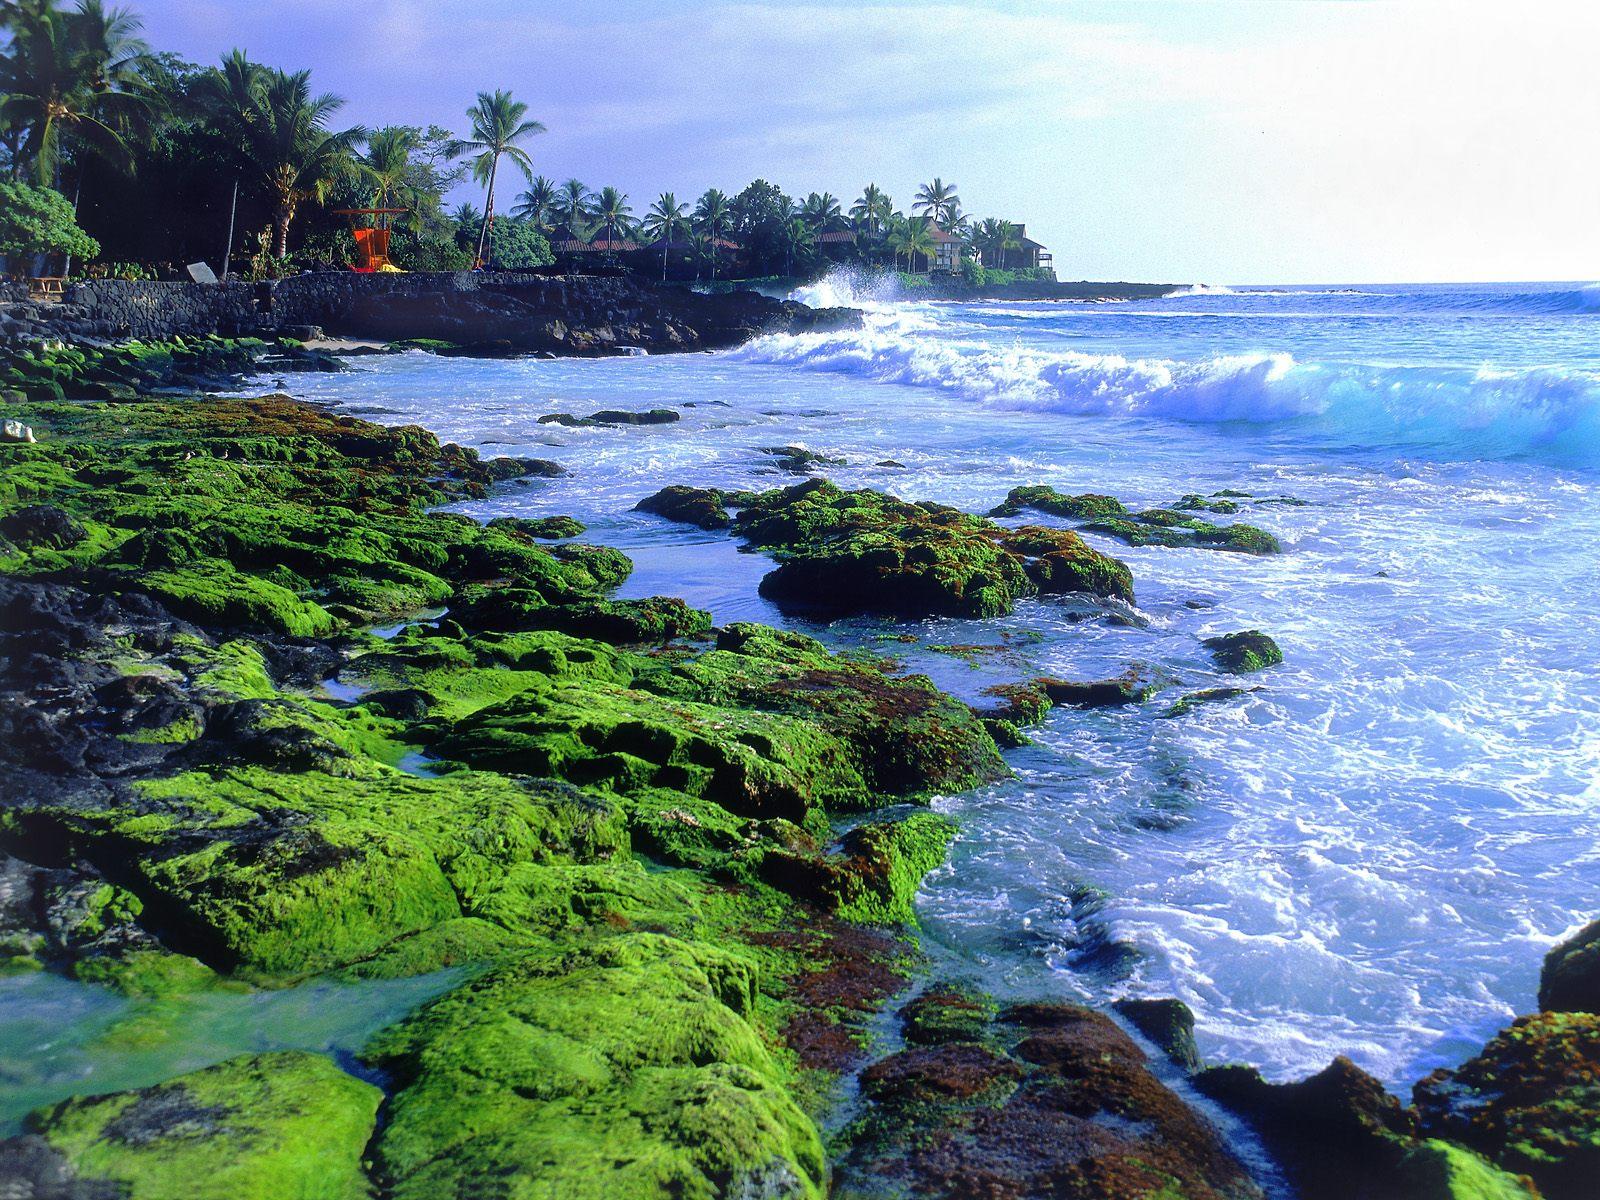 Tourism: Hawaiian Islands